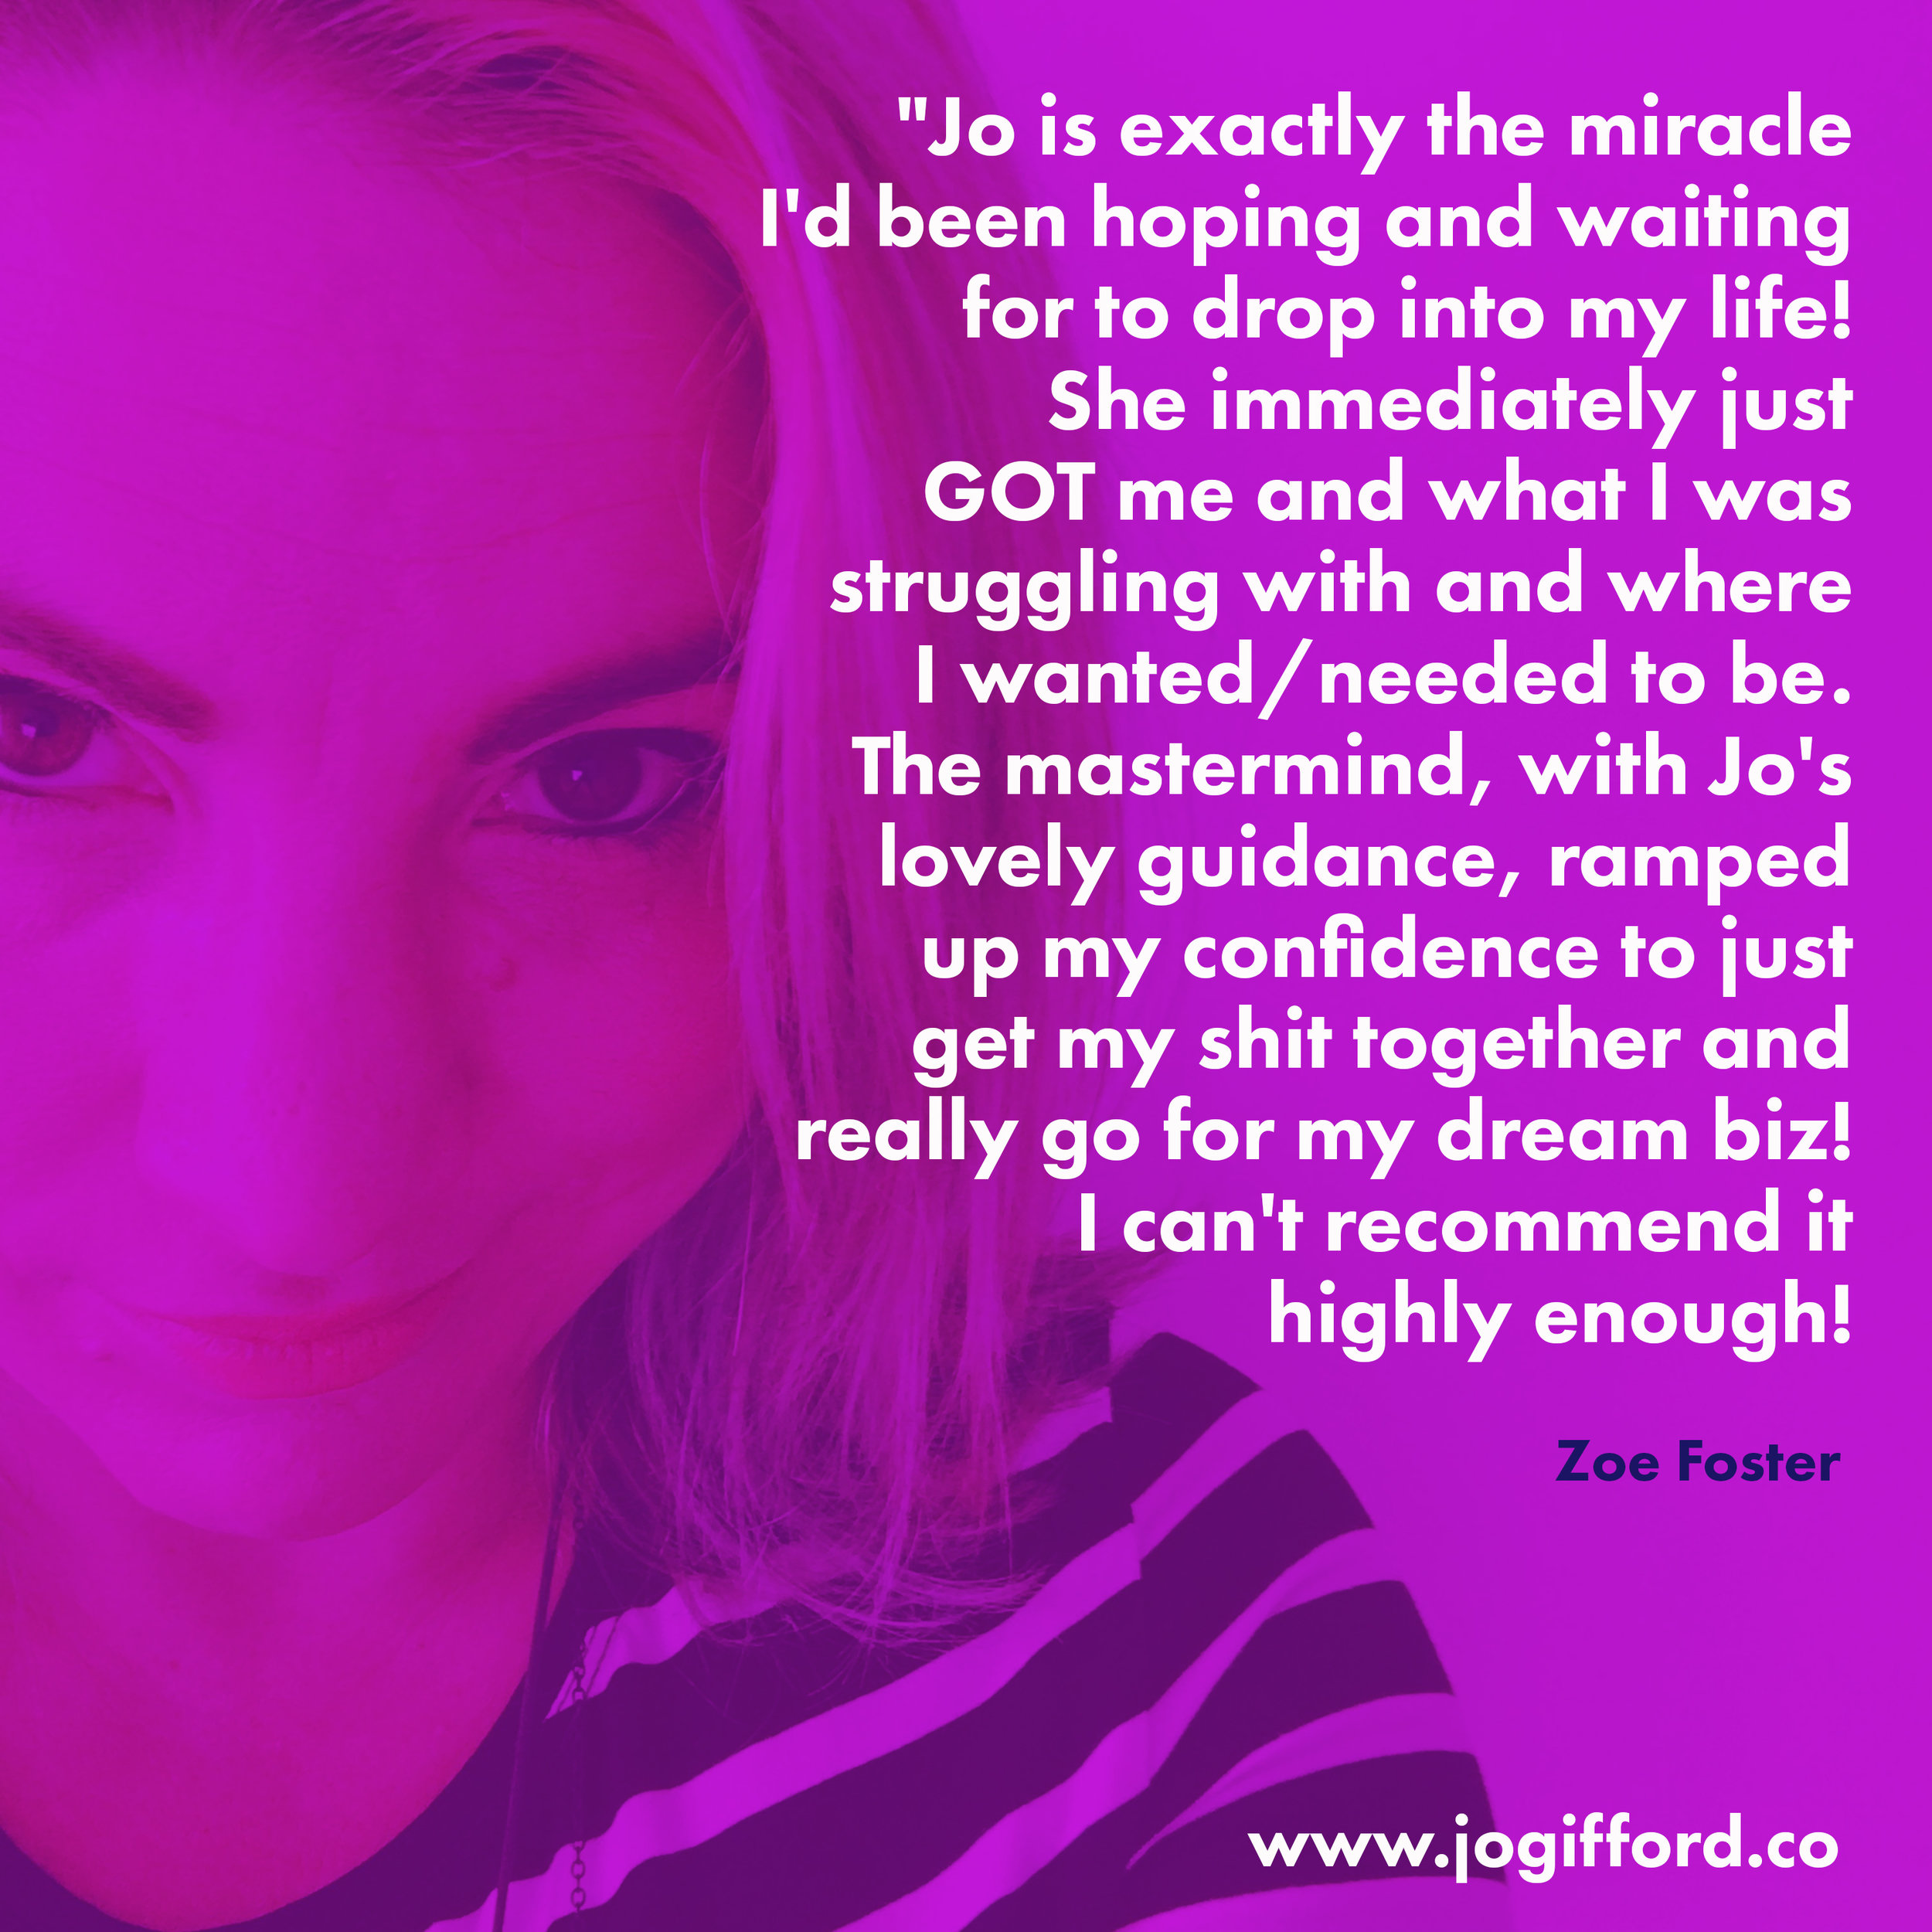 Testimonial-graphic---Zoe-Foster.jpg